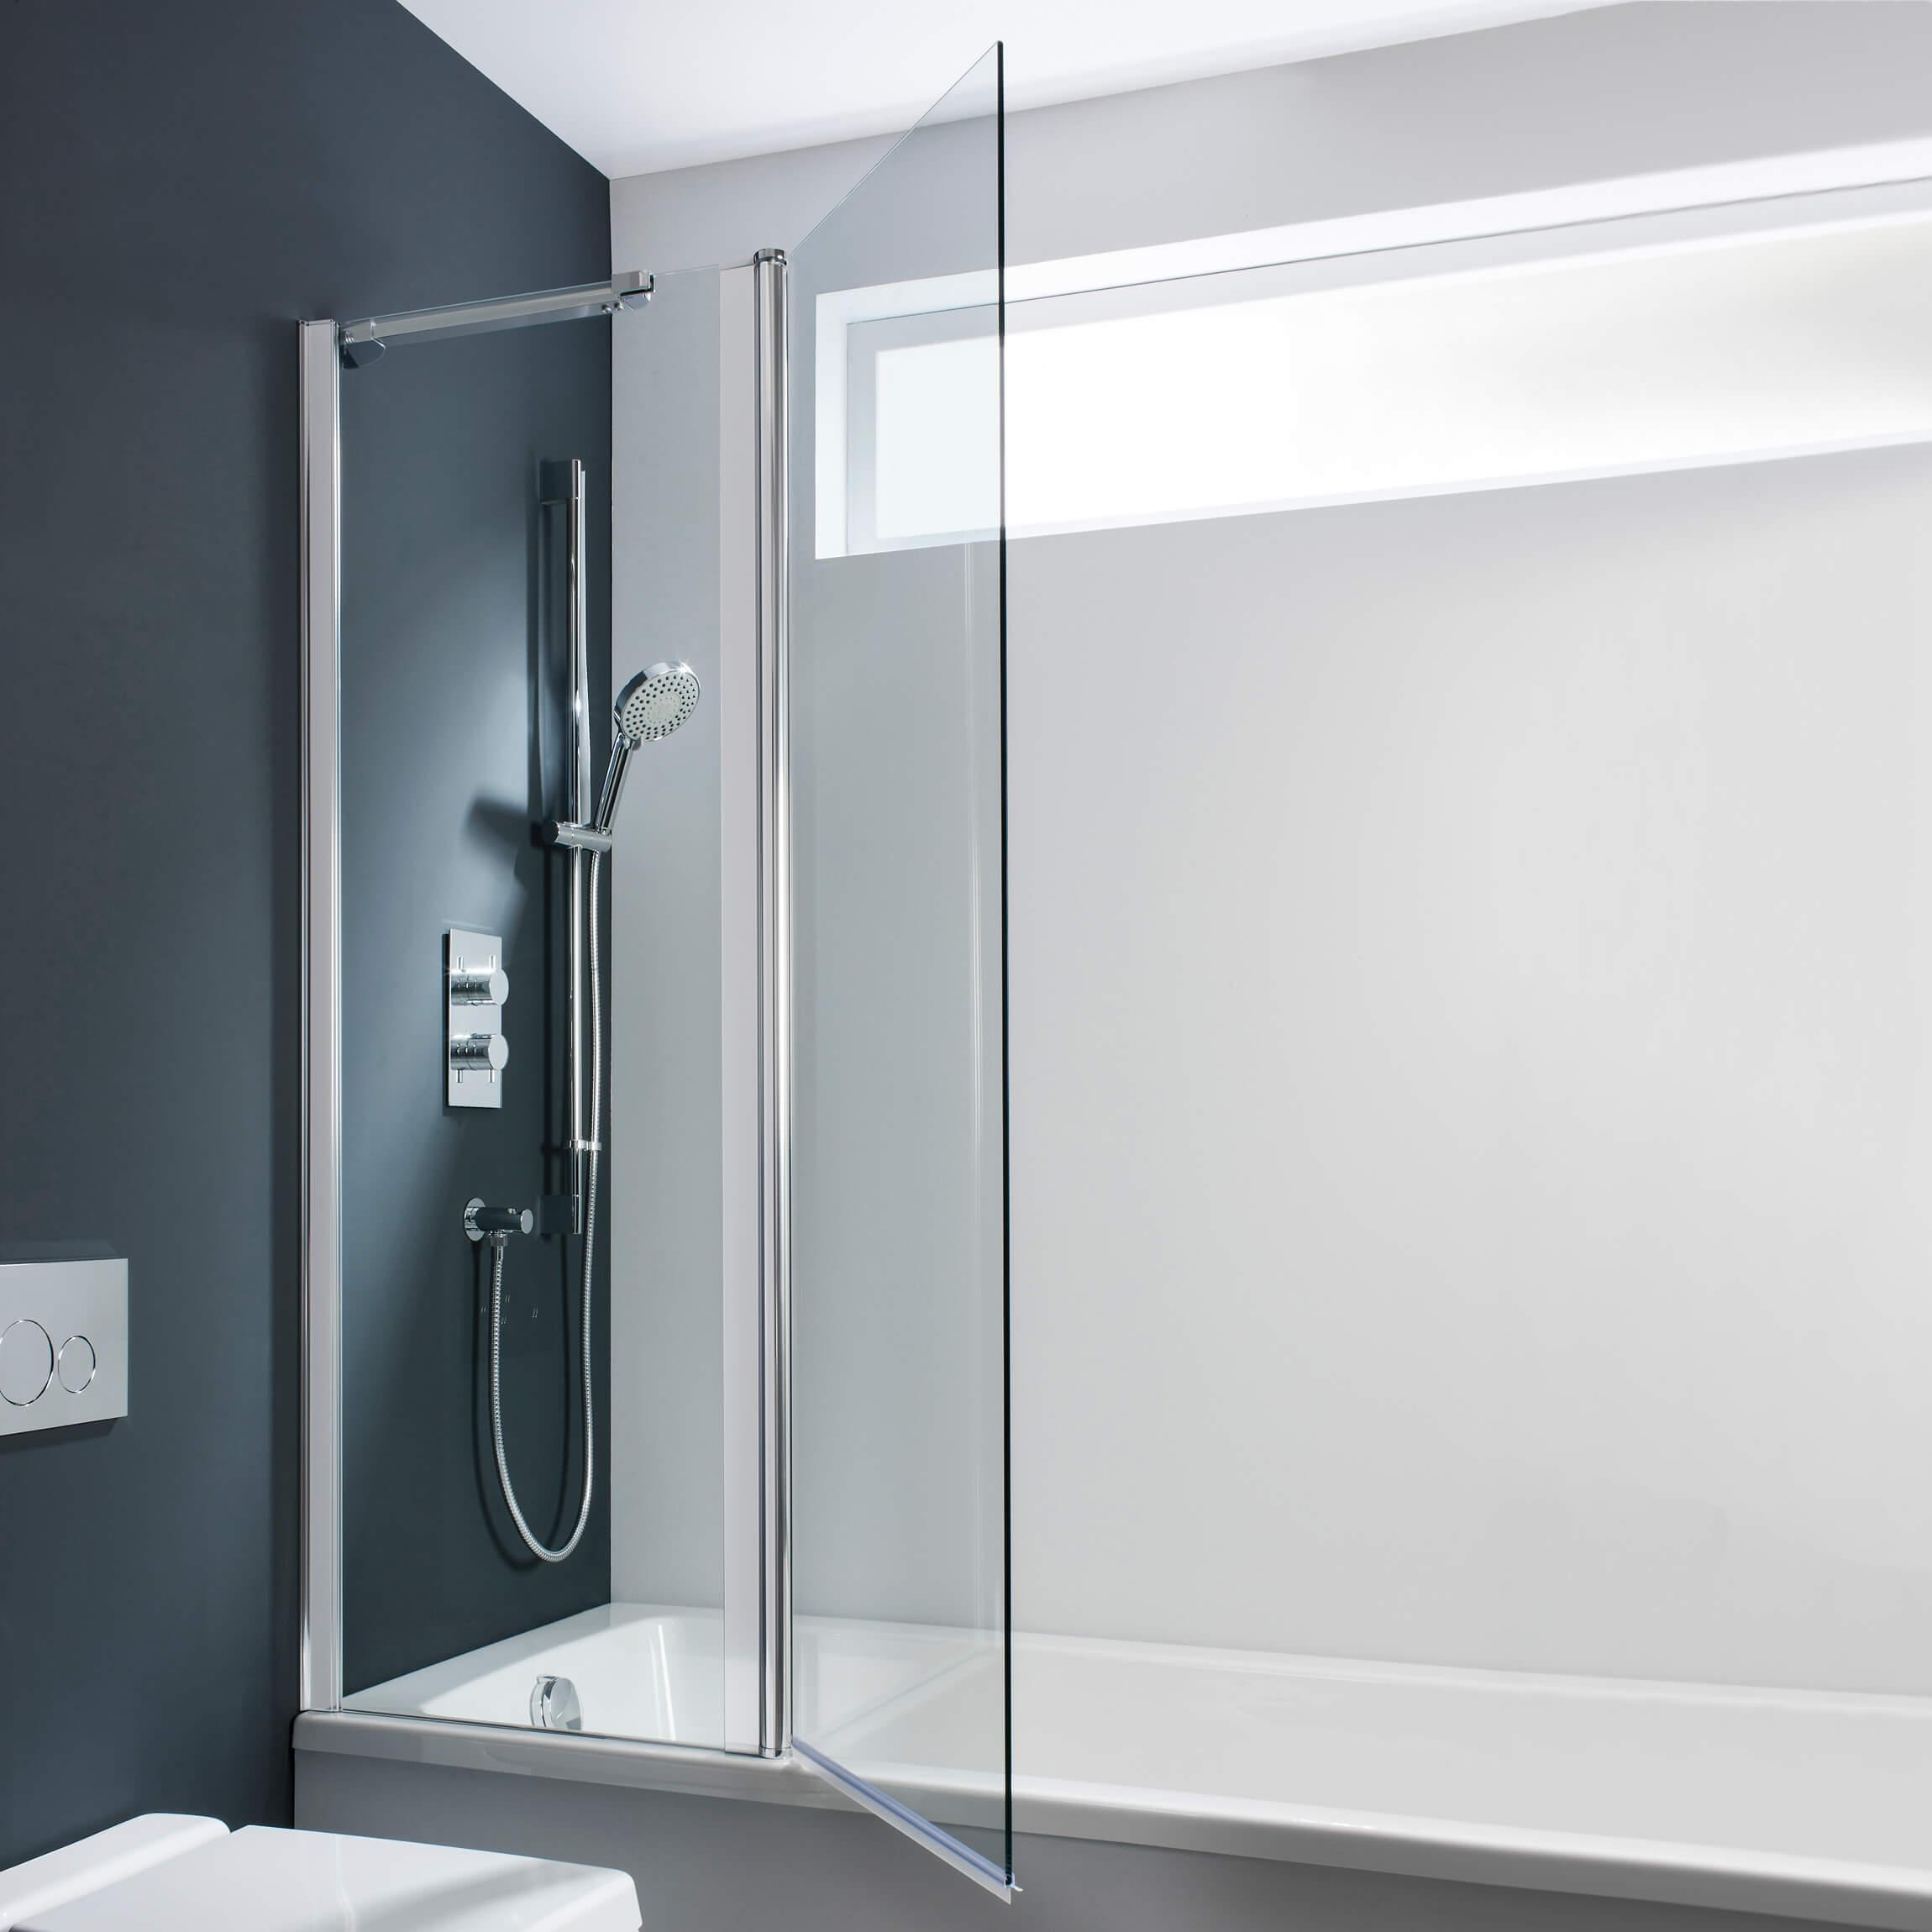 Design Double Folding Bath Screen Bath Screens